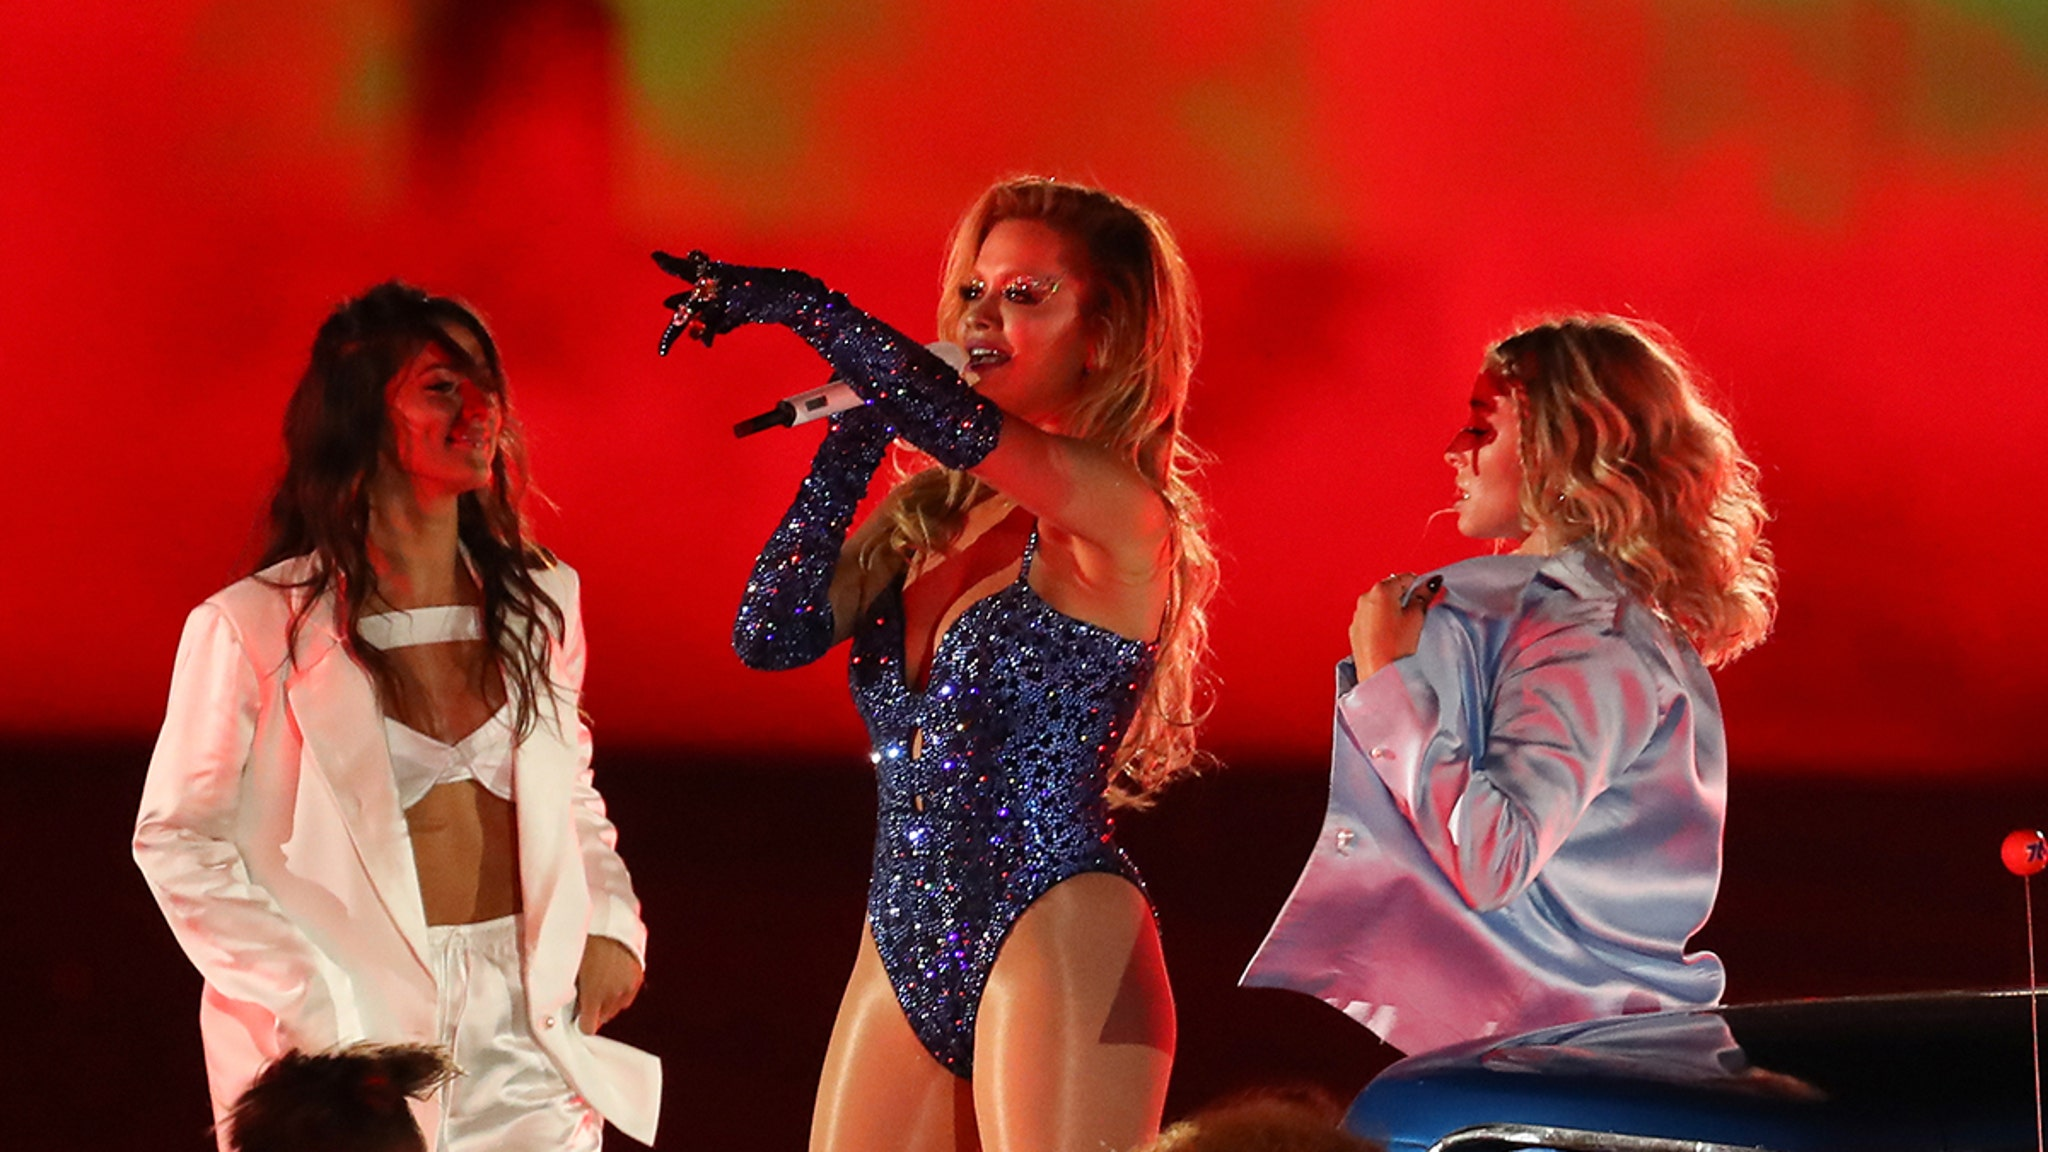 Australia Gay & Lesbian Mardi Gras Rita Ora Headlines to 35,000 Fans